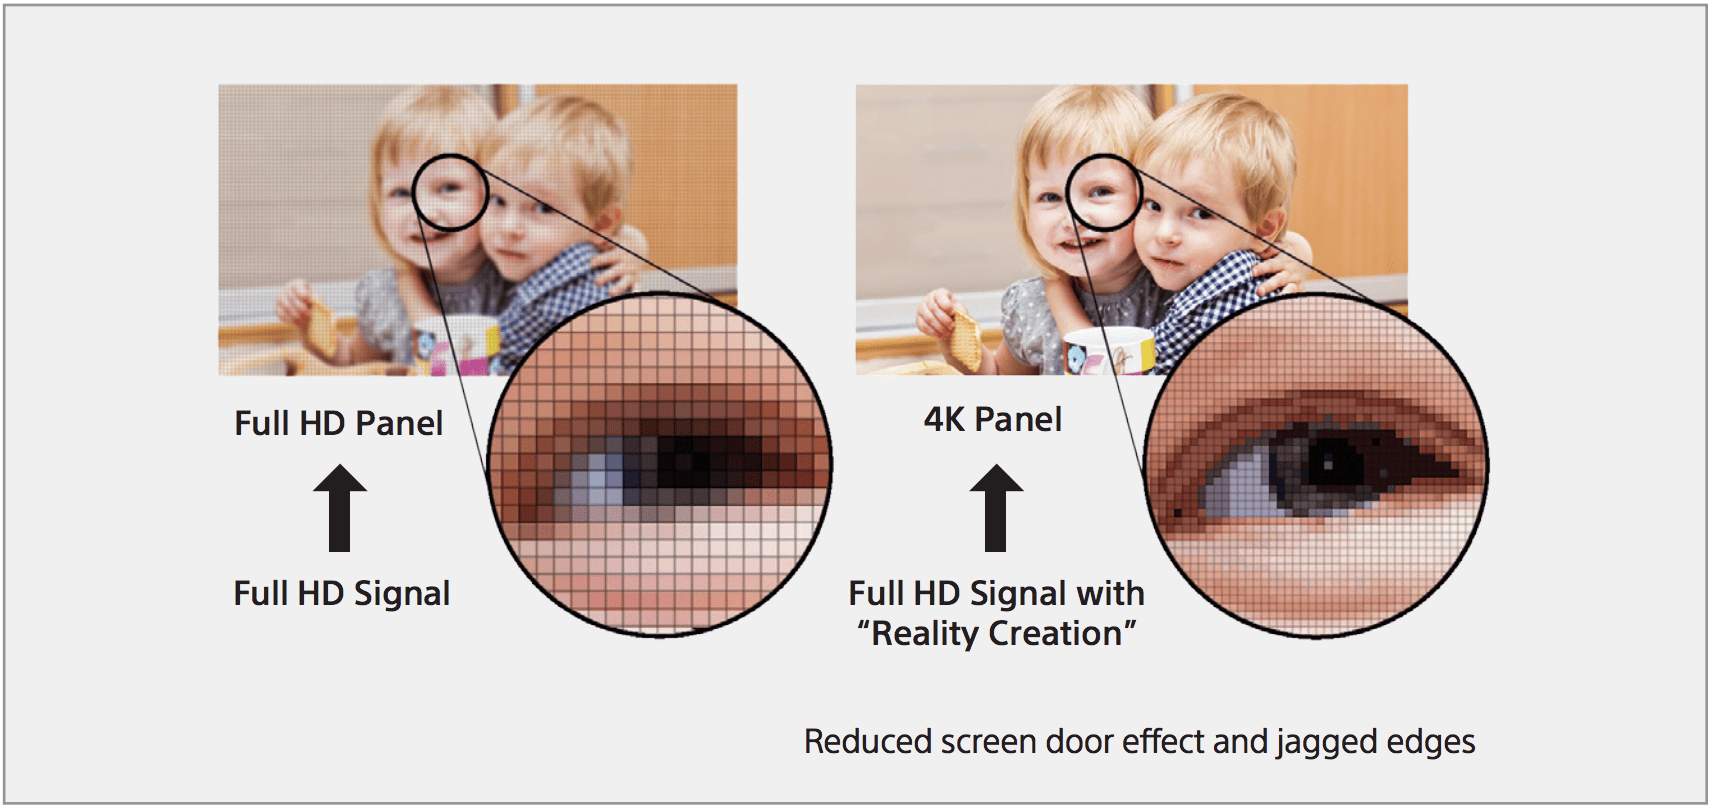 Vergleich Full HD versus 4K Panel Sony Laserbeamer VPL-VW760ES